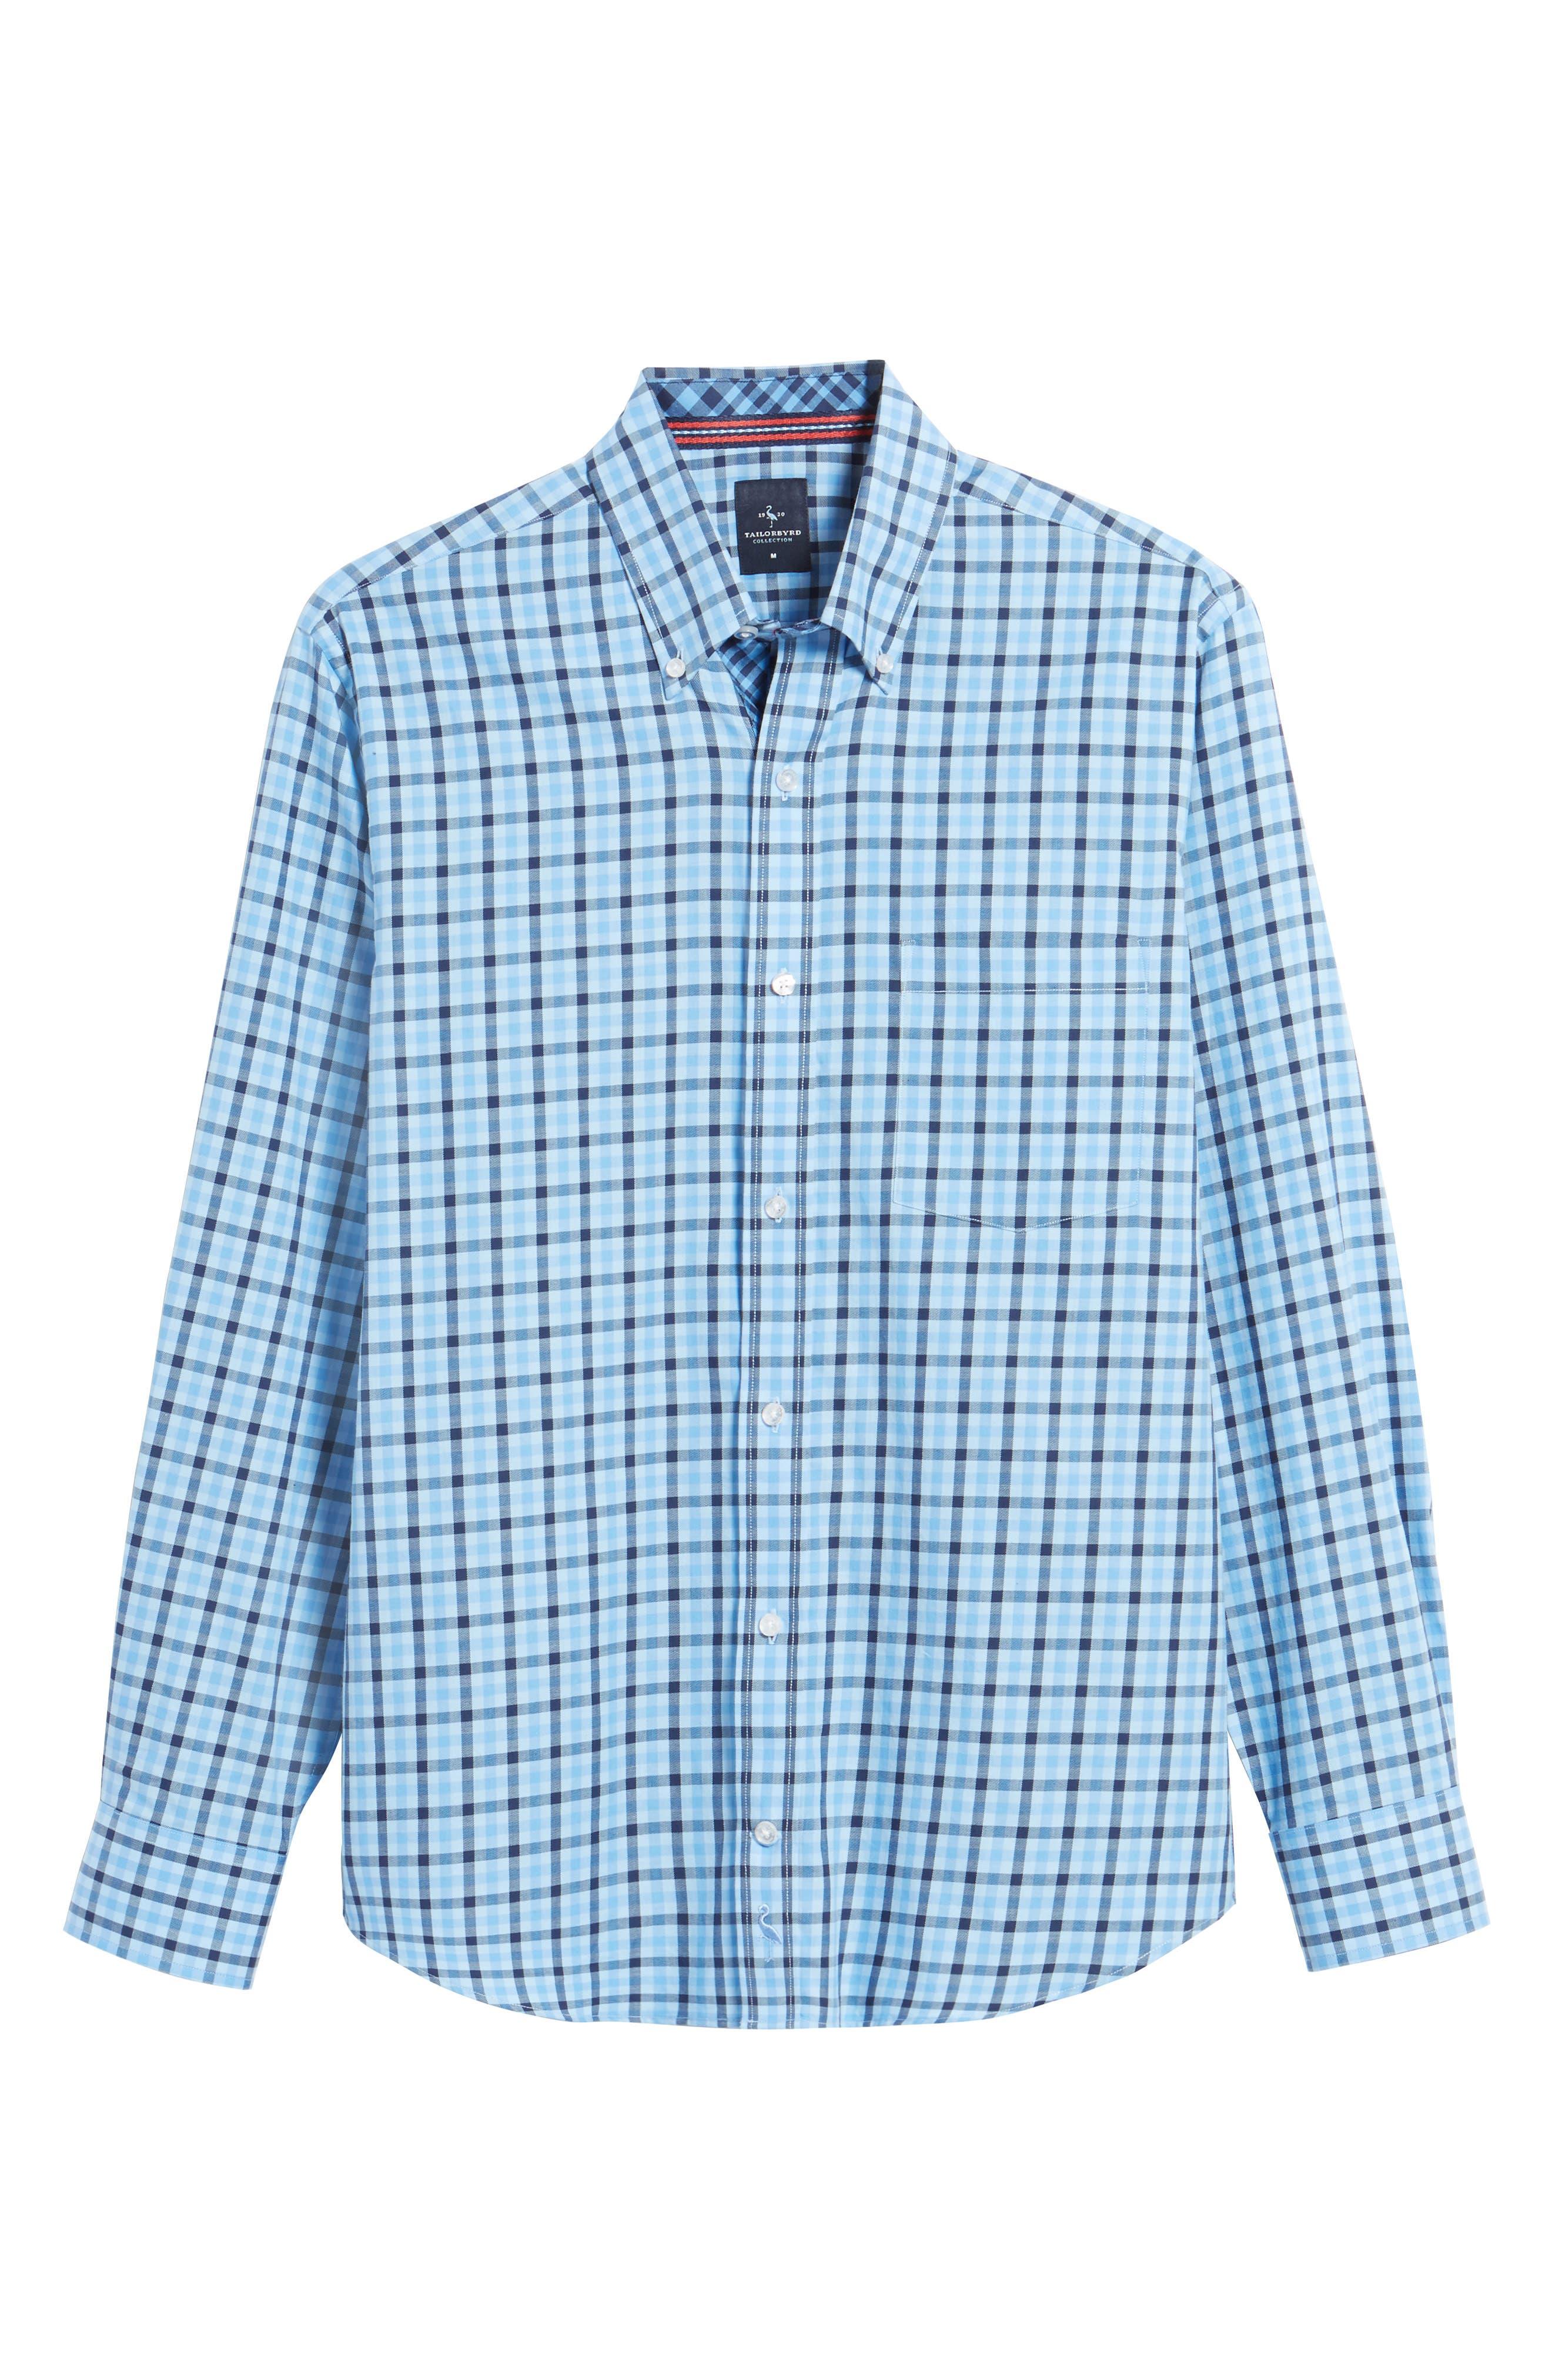 Bridge City Gingham Twill Sport Shirt,                             Alternate thumbnail 6, color,                             Blue